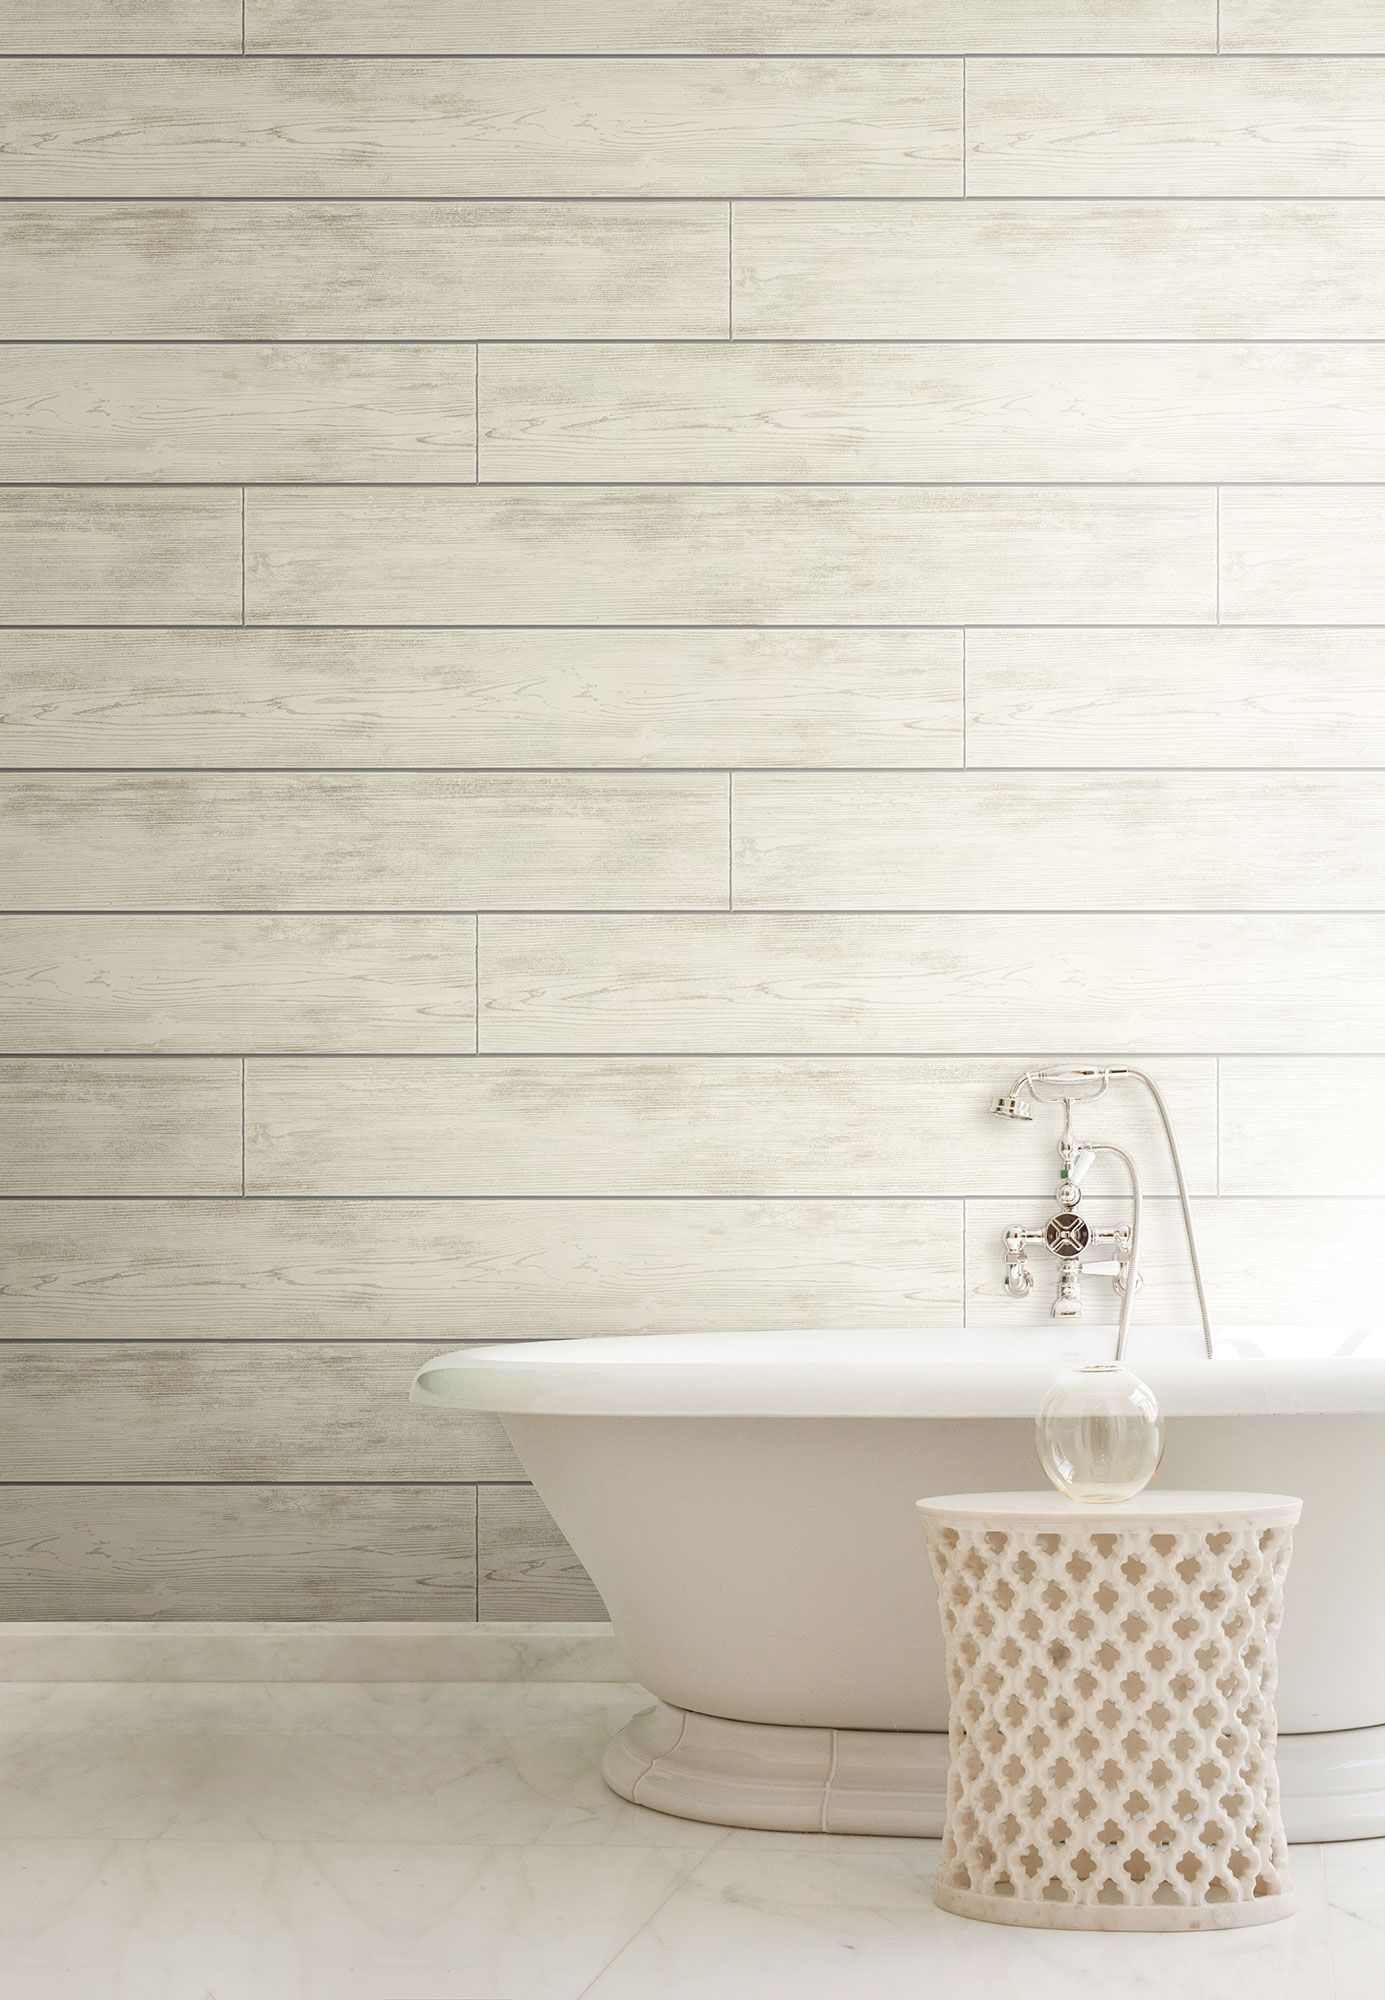 Magnolia Home Shiplap Wallpaper Warm Gray in 2020